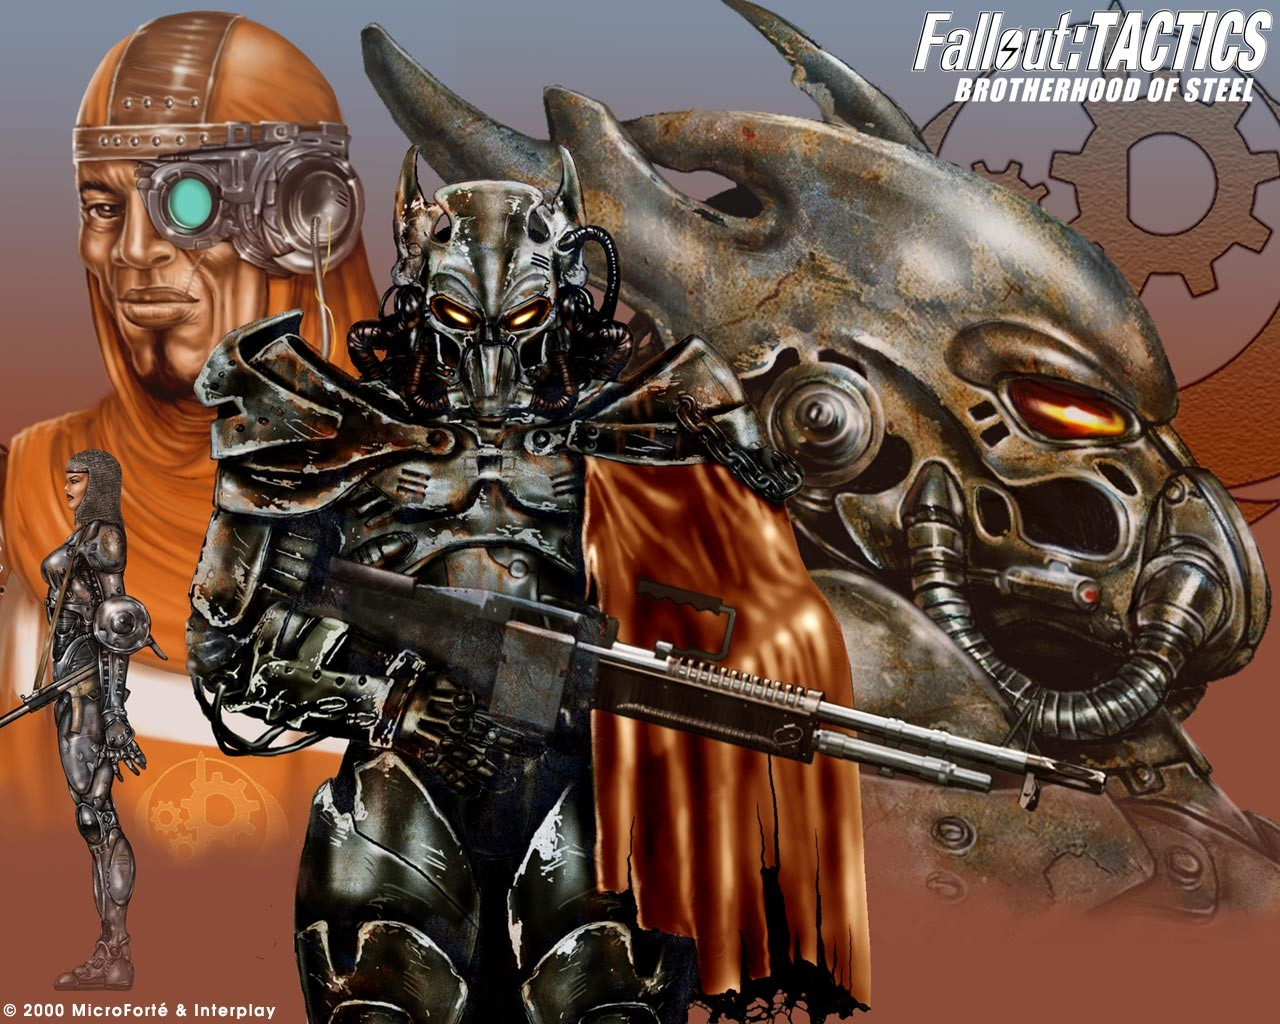 Fallout 3 porn machinima smut tube